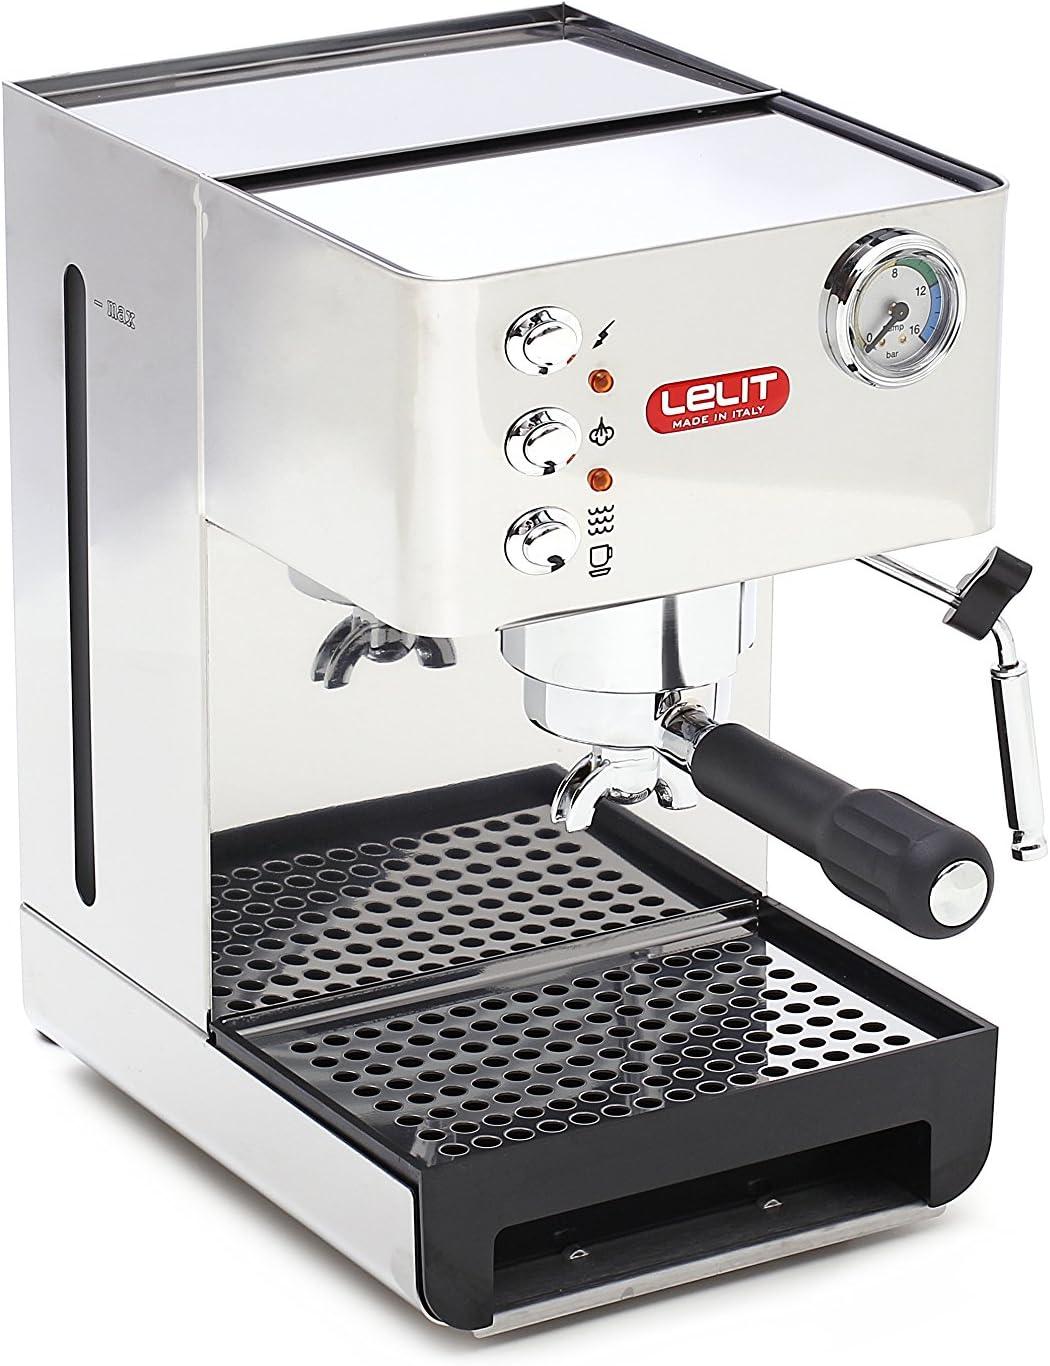 Lelit PL41EM Anna, Máquina de Espresso Semiprofesional – Ideal ...